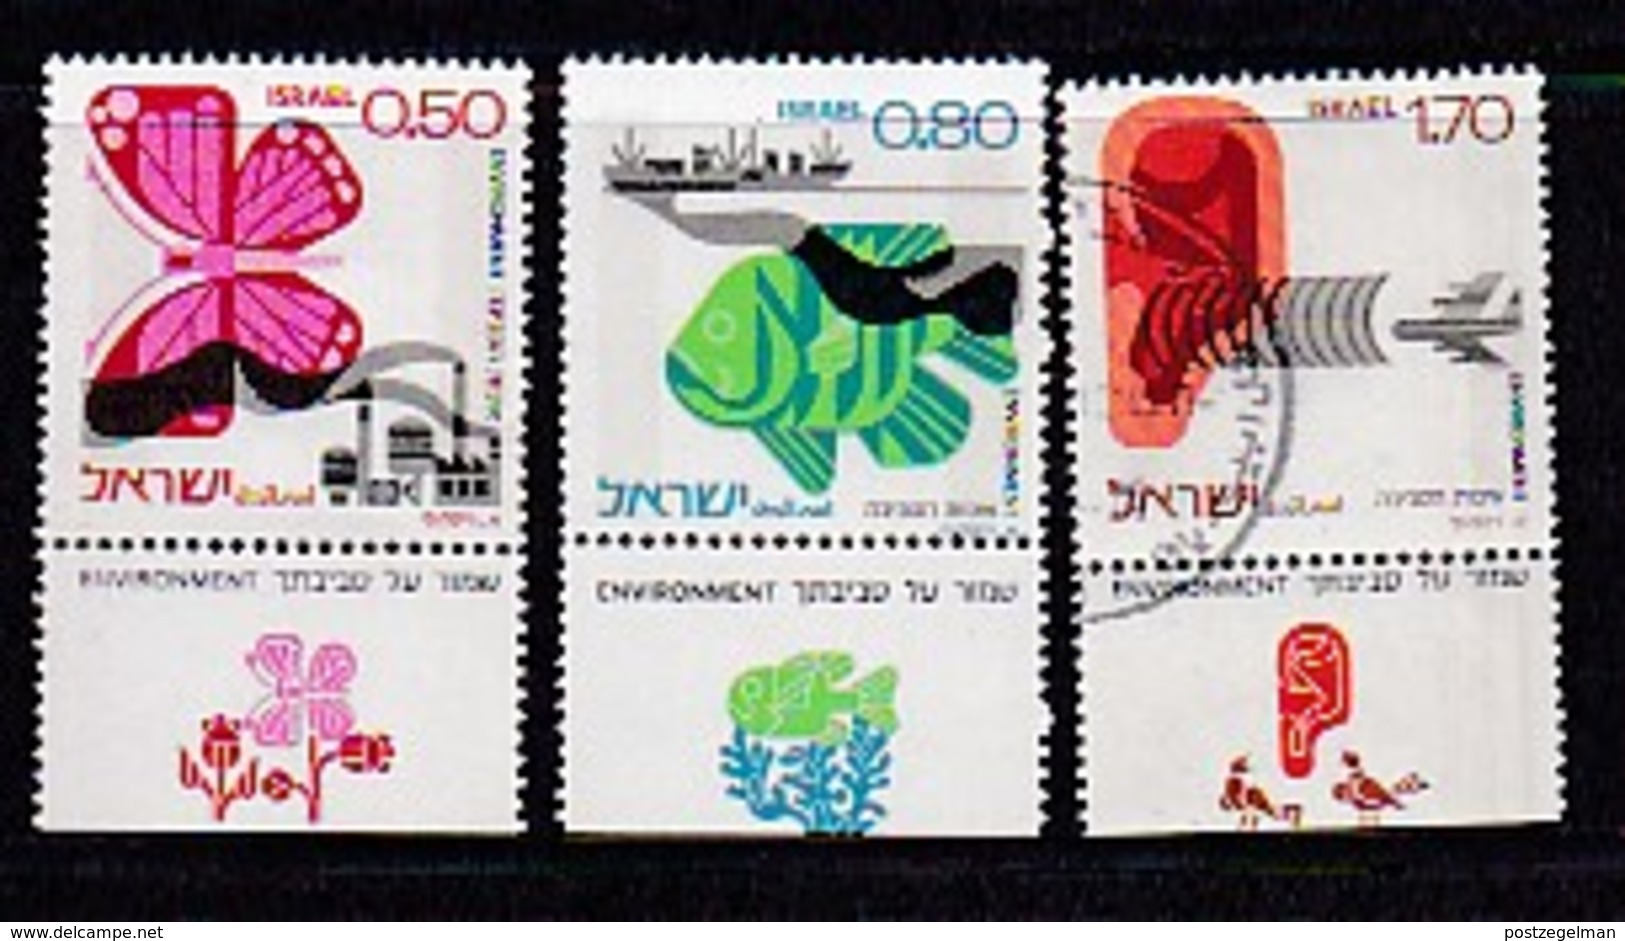 ISRAEL, 1975, Unused Hinged Stamp(s), With Tab, Environment Quality, SG617-619, Scannr. 17460 - Israel